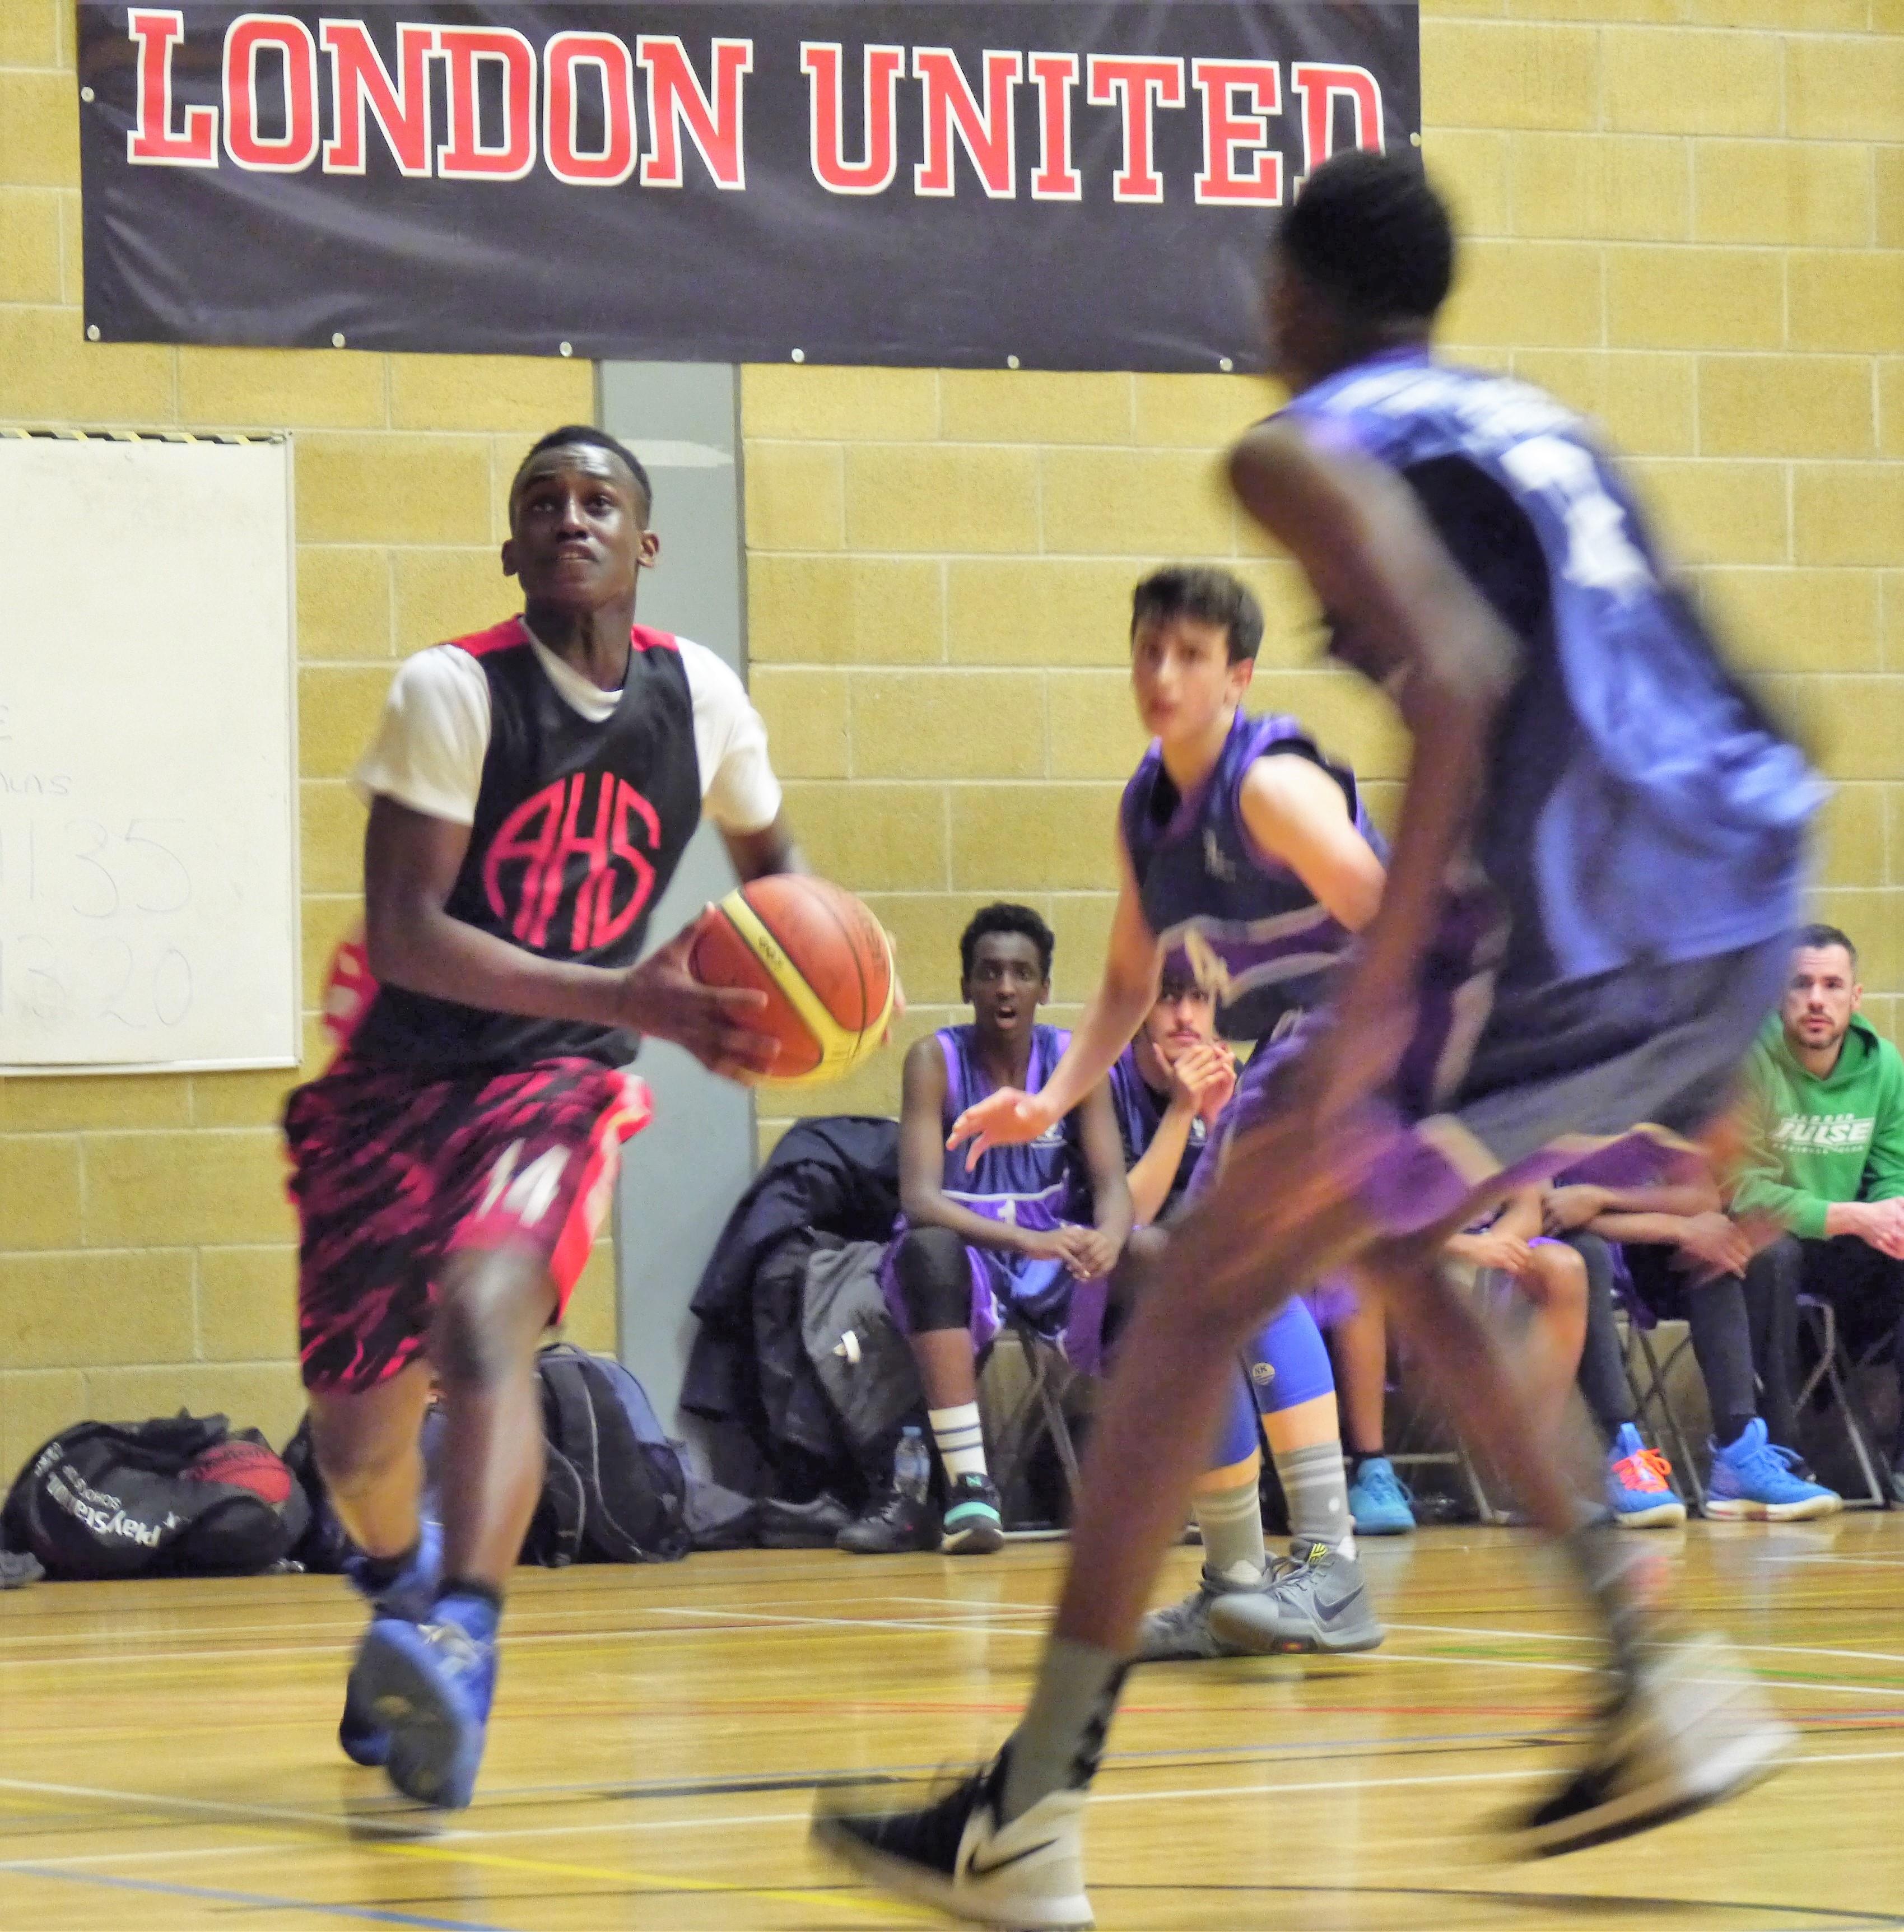 London United Basketball Club United Basketball League UBL